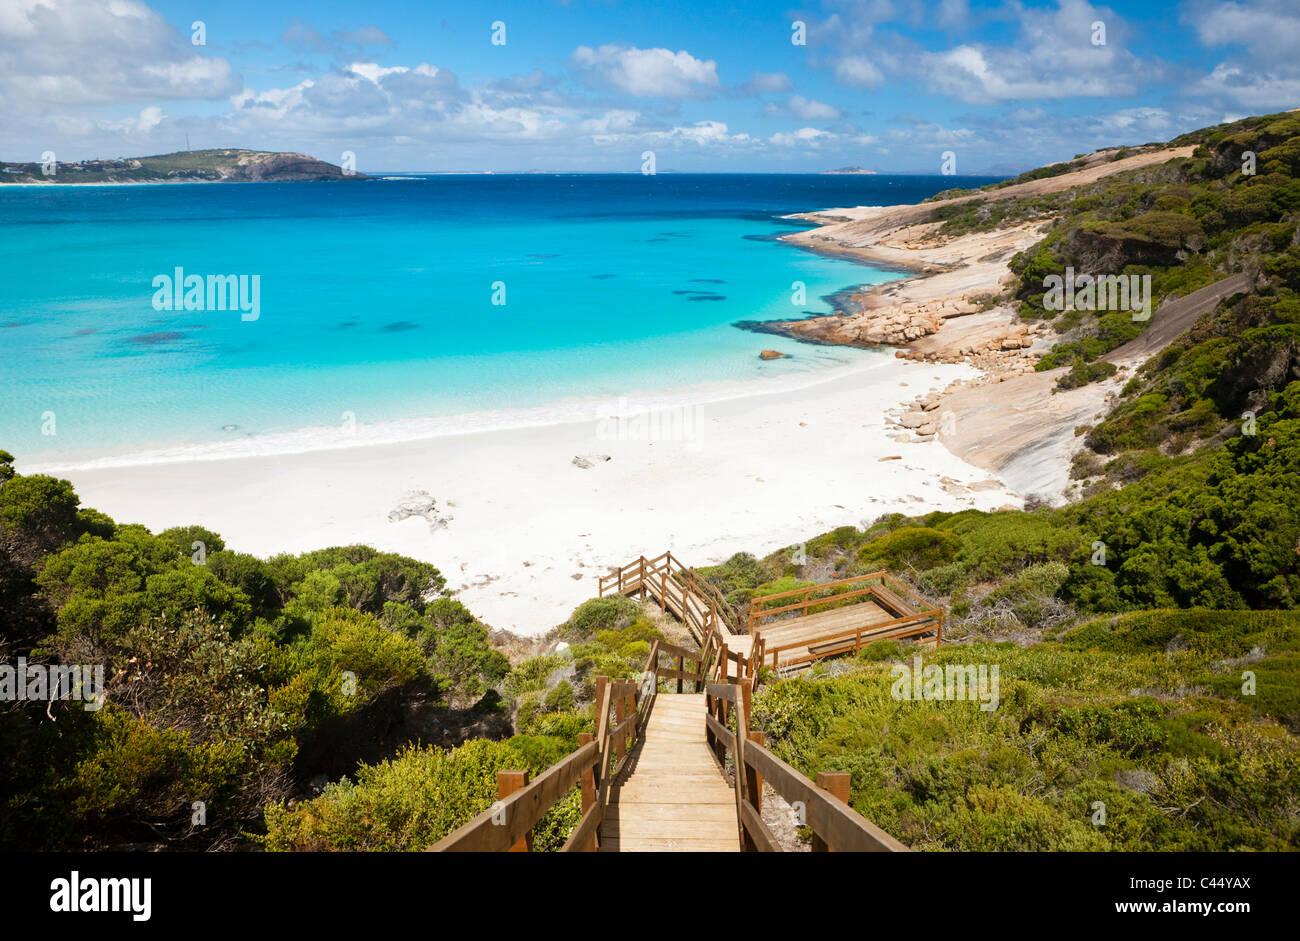 Boardwalk menant à Blue Haven Beach. Esperance, Australie occidentale, Australie Photo Stock